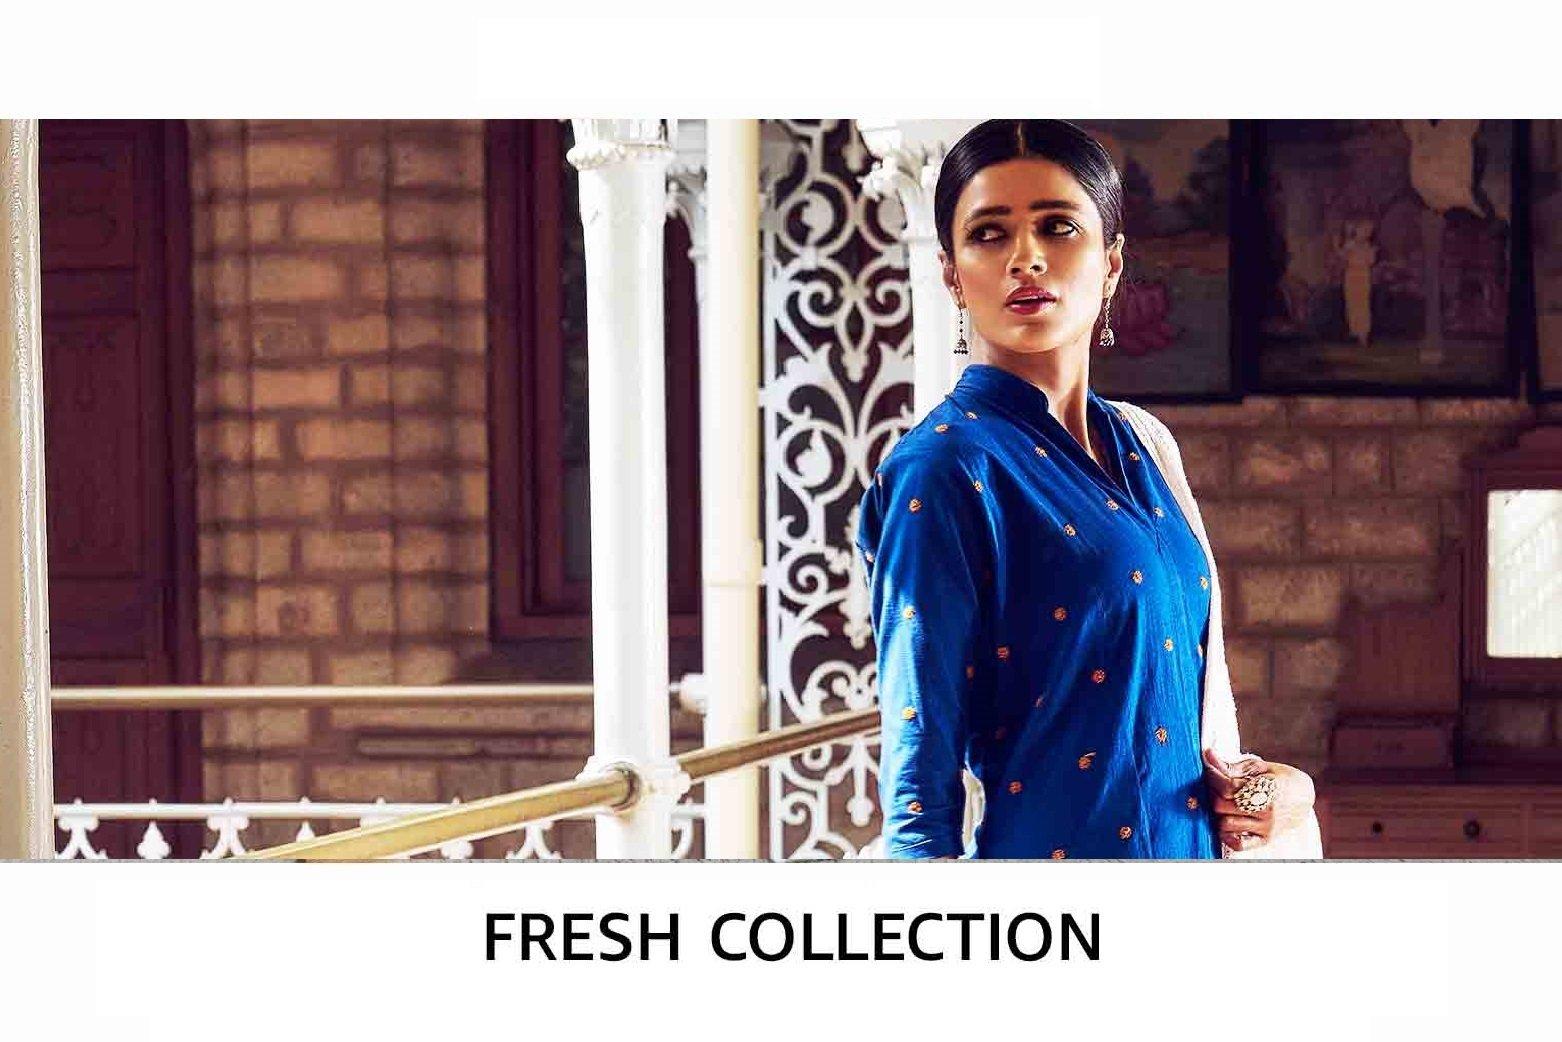 Handloom Clothing S For Women Buy Women Handloom Clothing S By